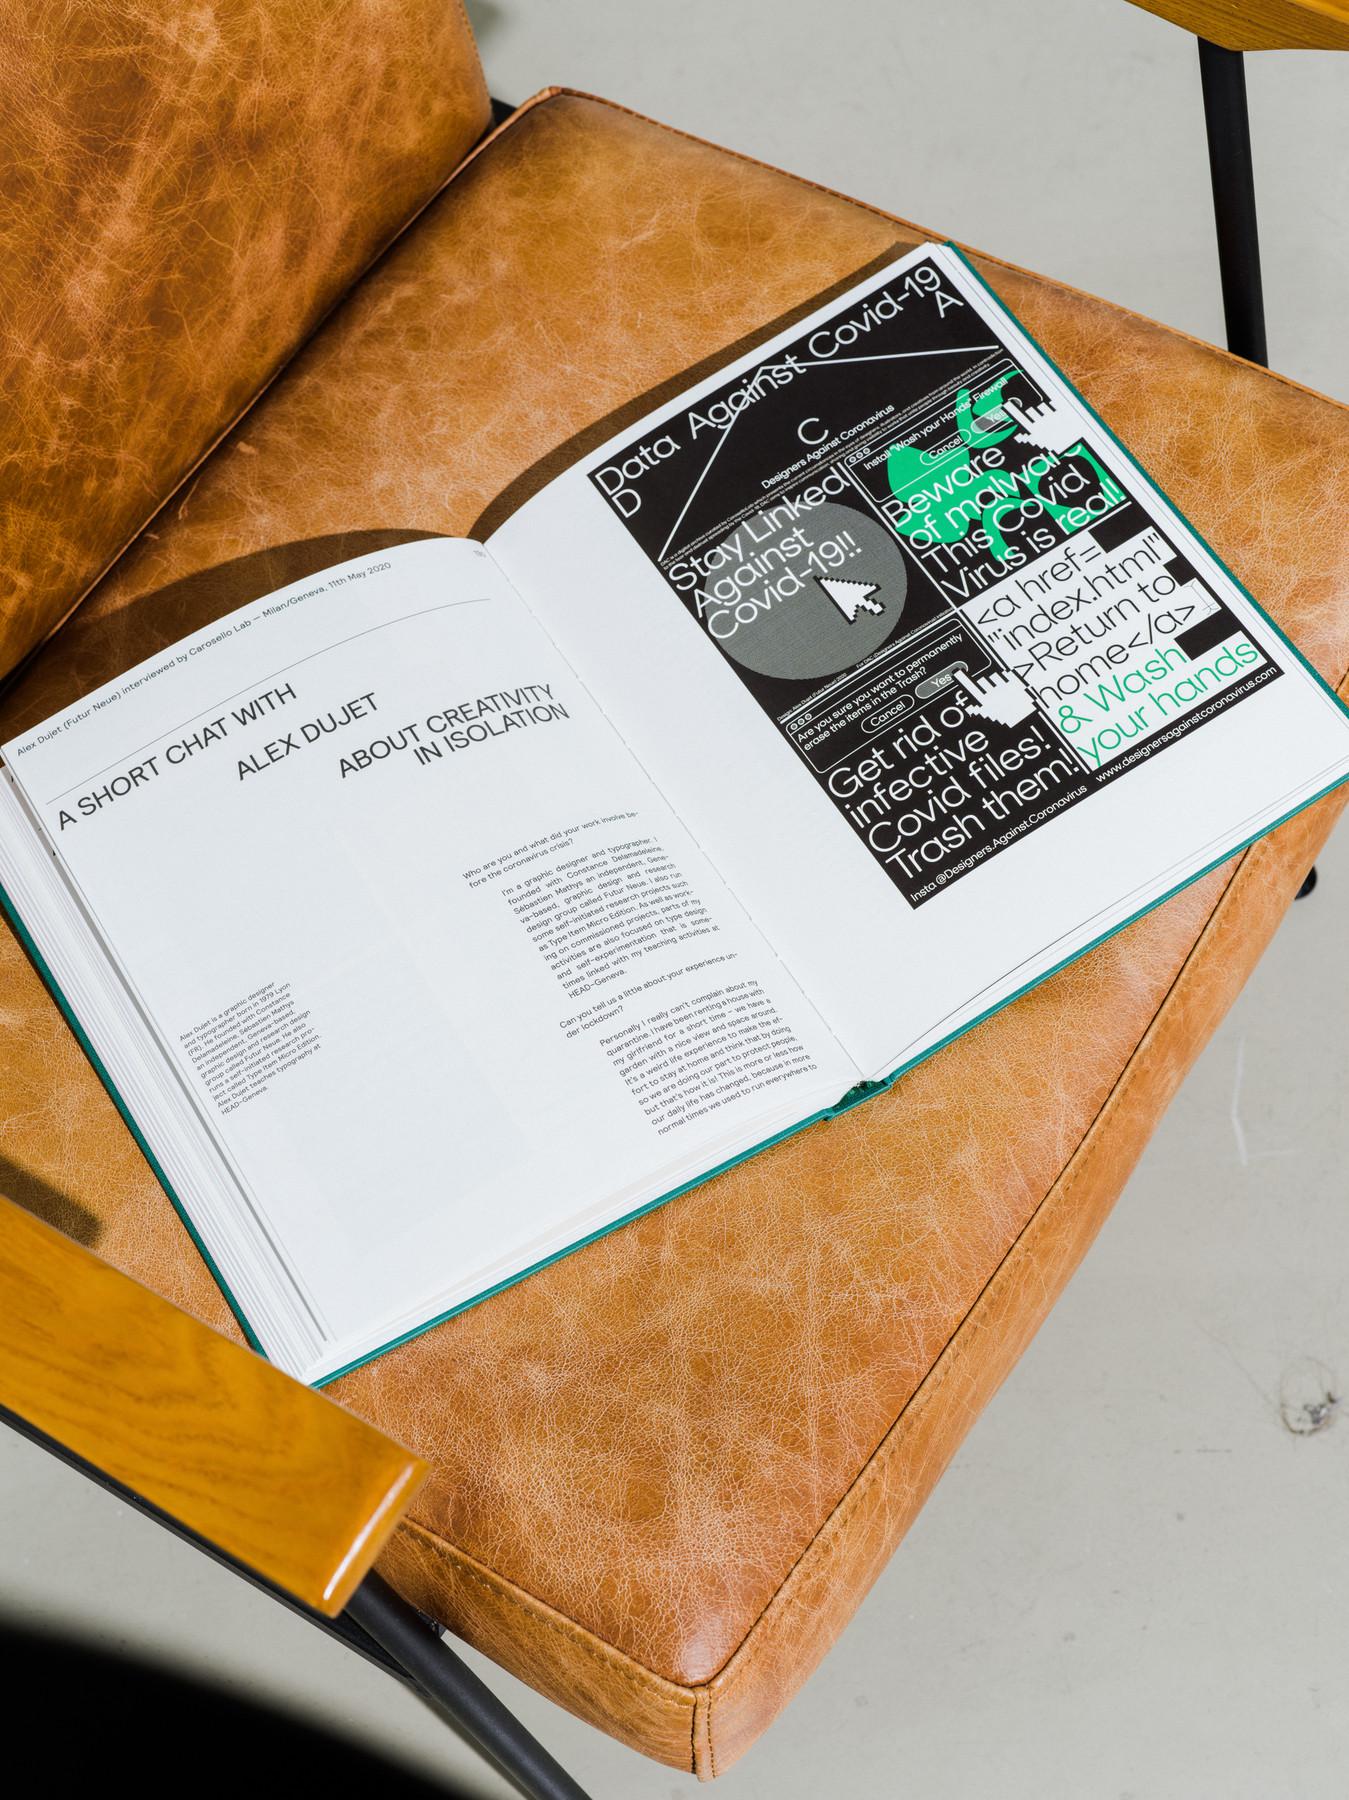 DAC Book CaroselloLab 033